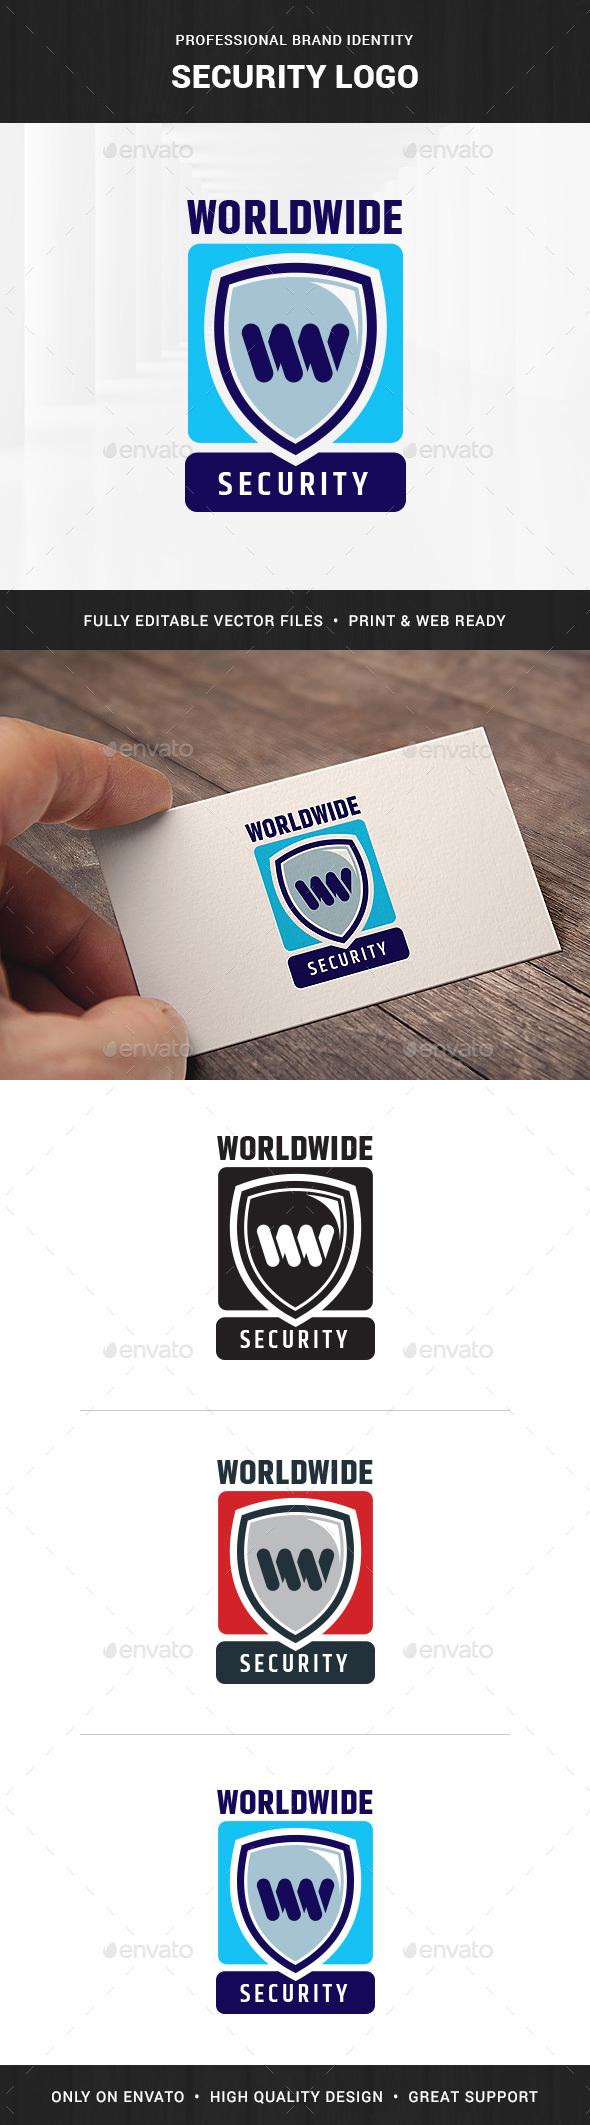 Security Logo Template